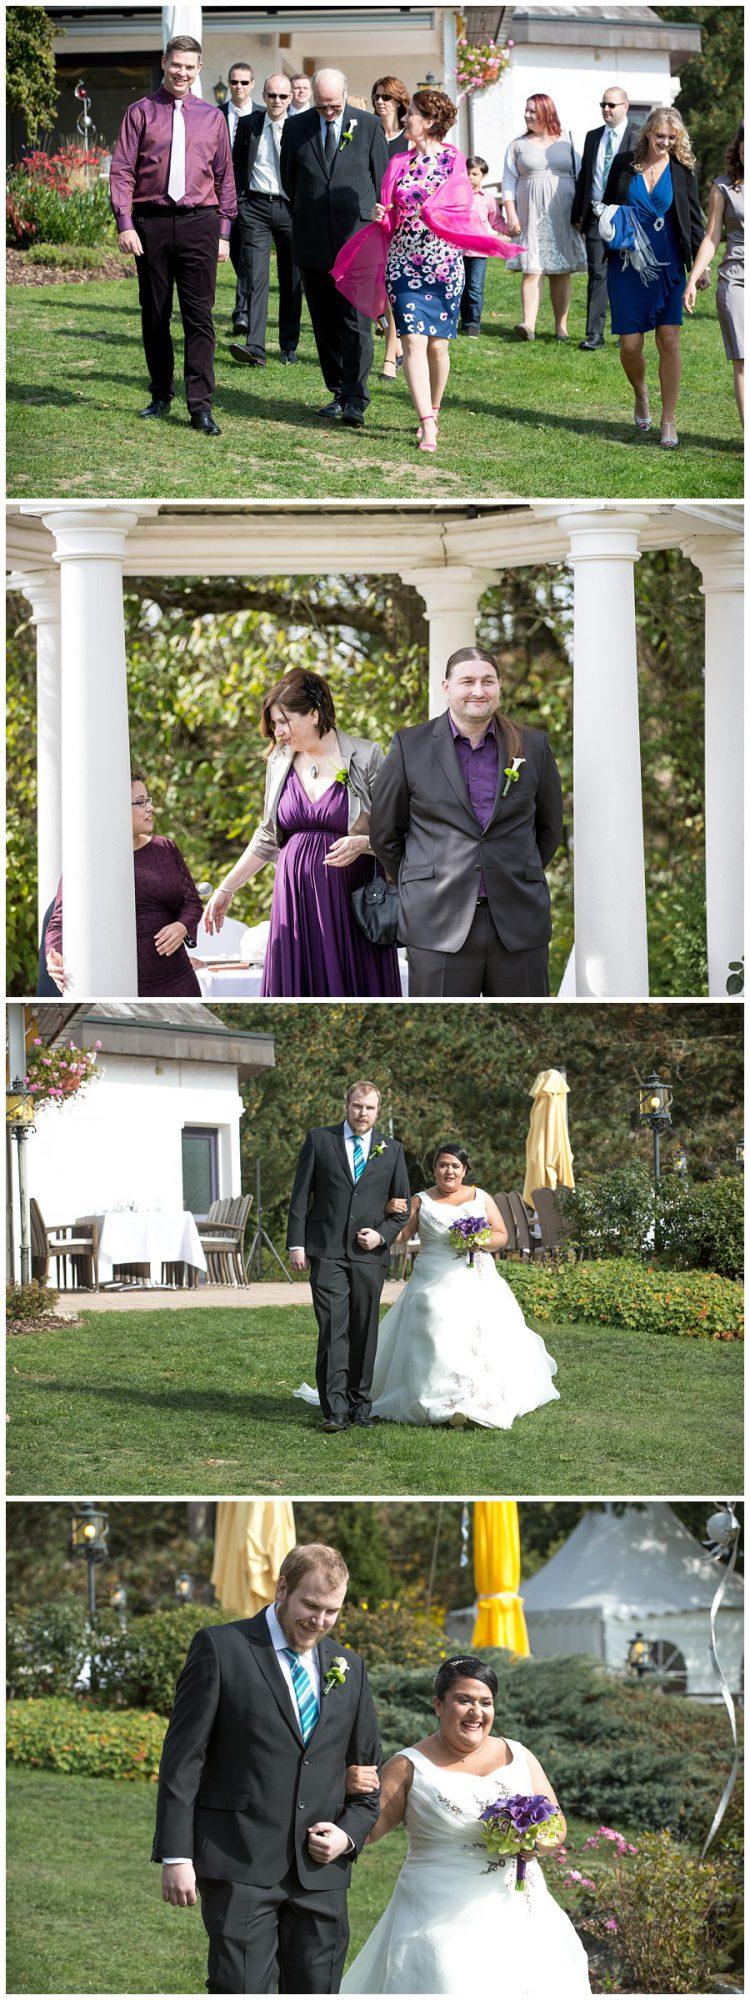 Hochzeit_Reitershof_Wirsberg_Claudia-Pelny-Fotografie_12